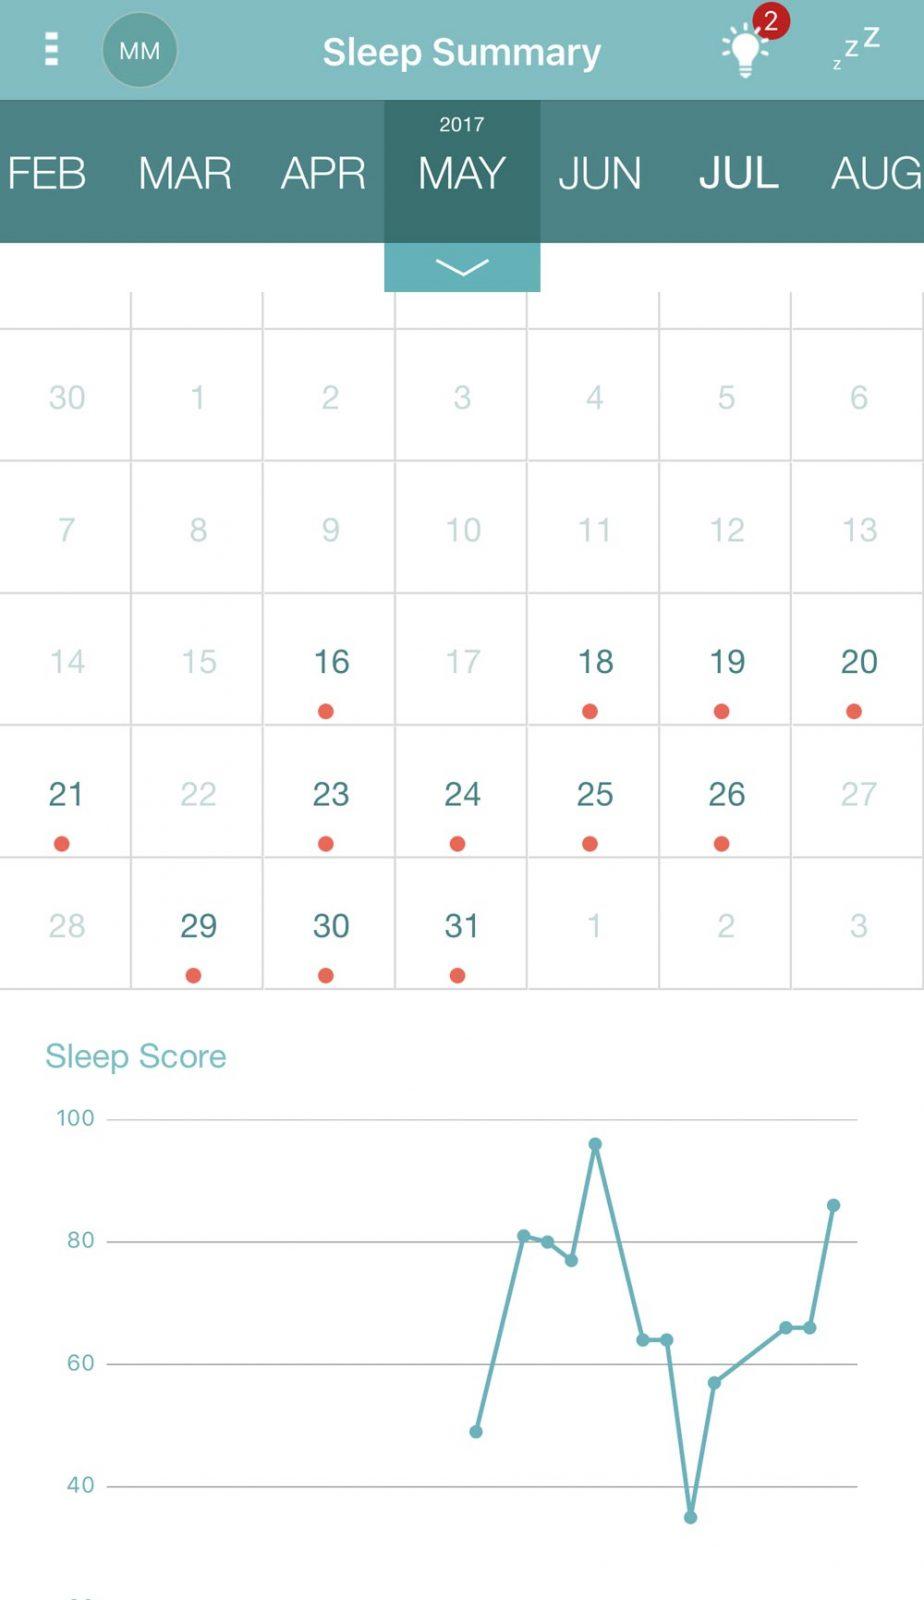 EarlySense Live monitors your health while you sleep #EARLYSENSELIVE